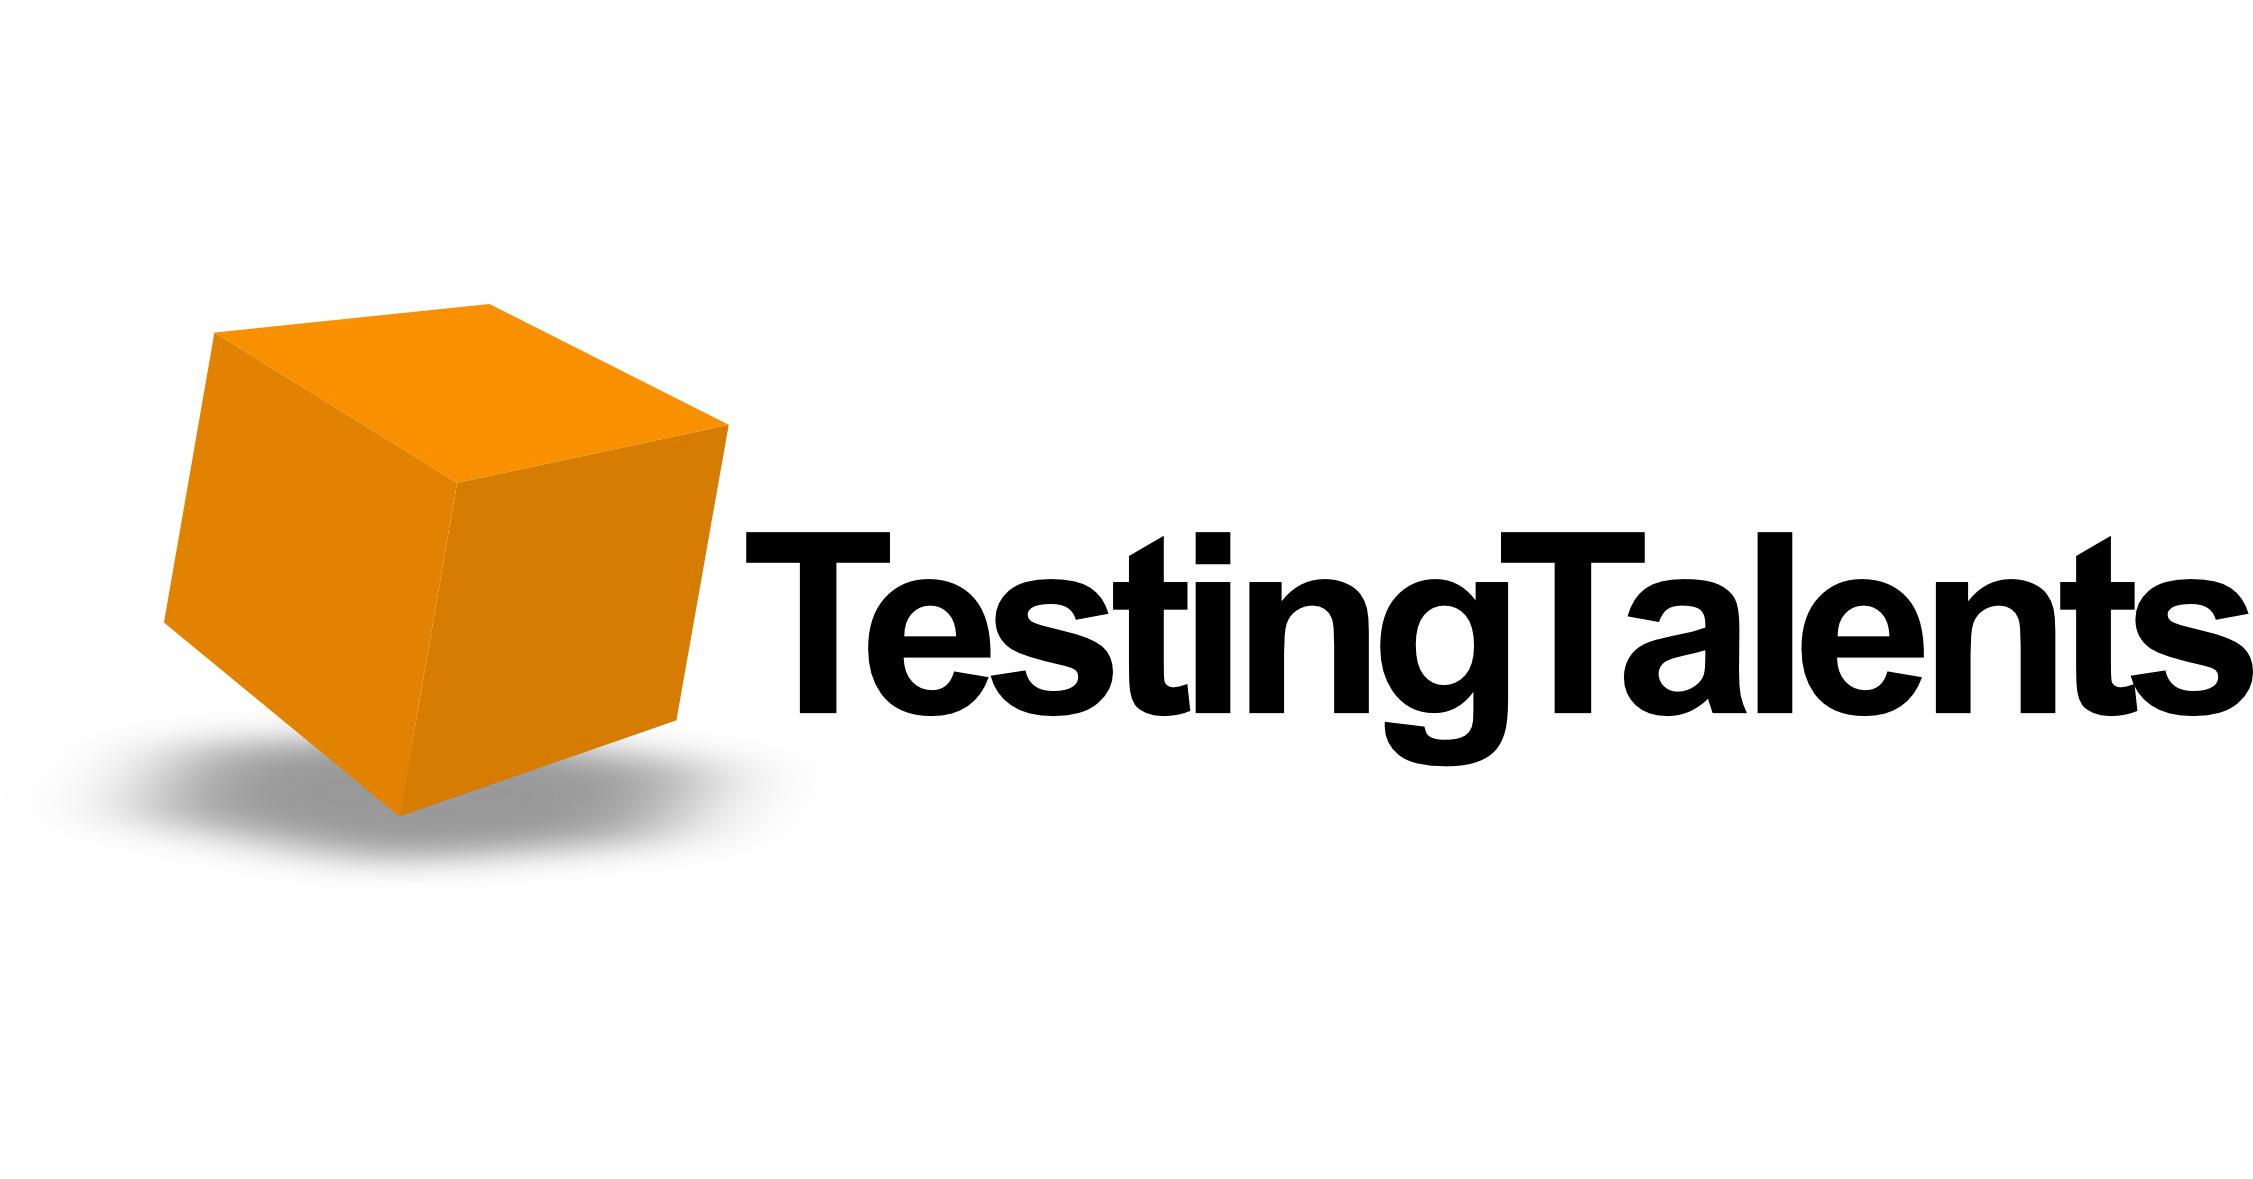 Testing Talents logo